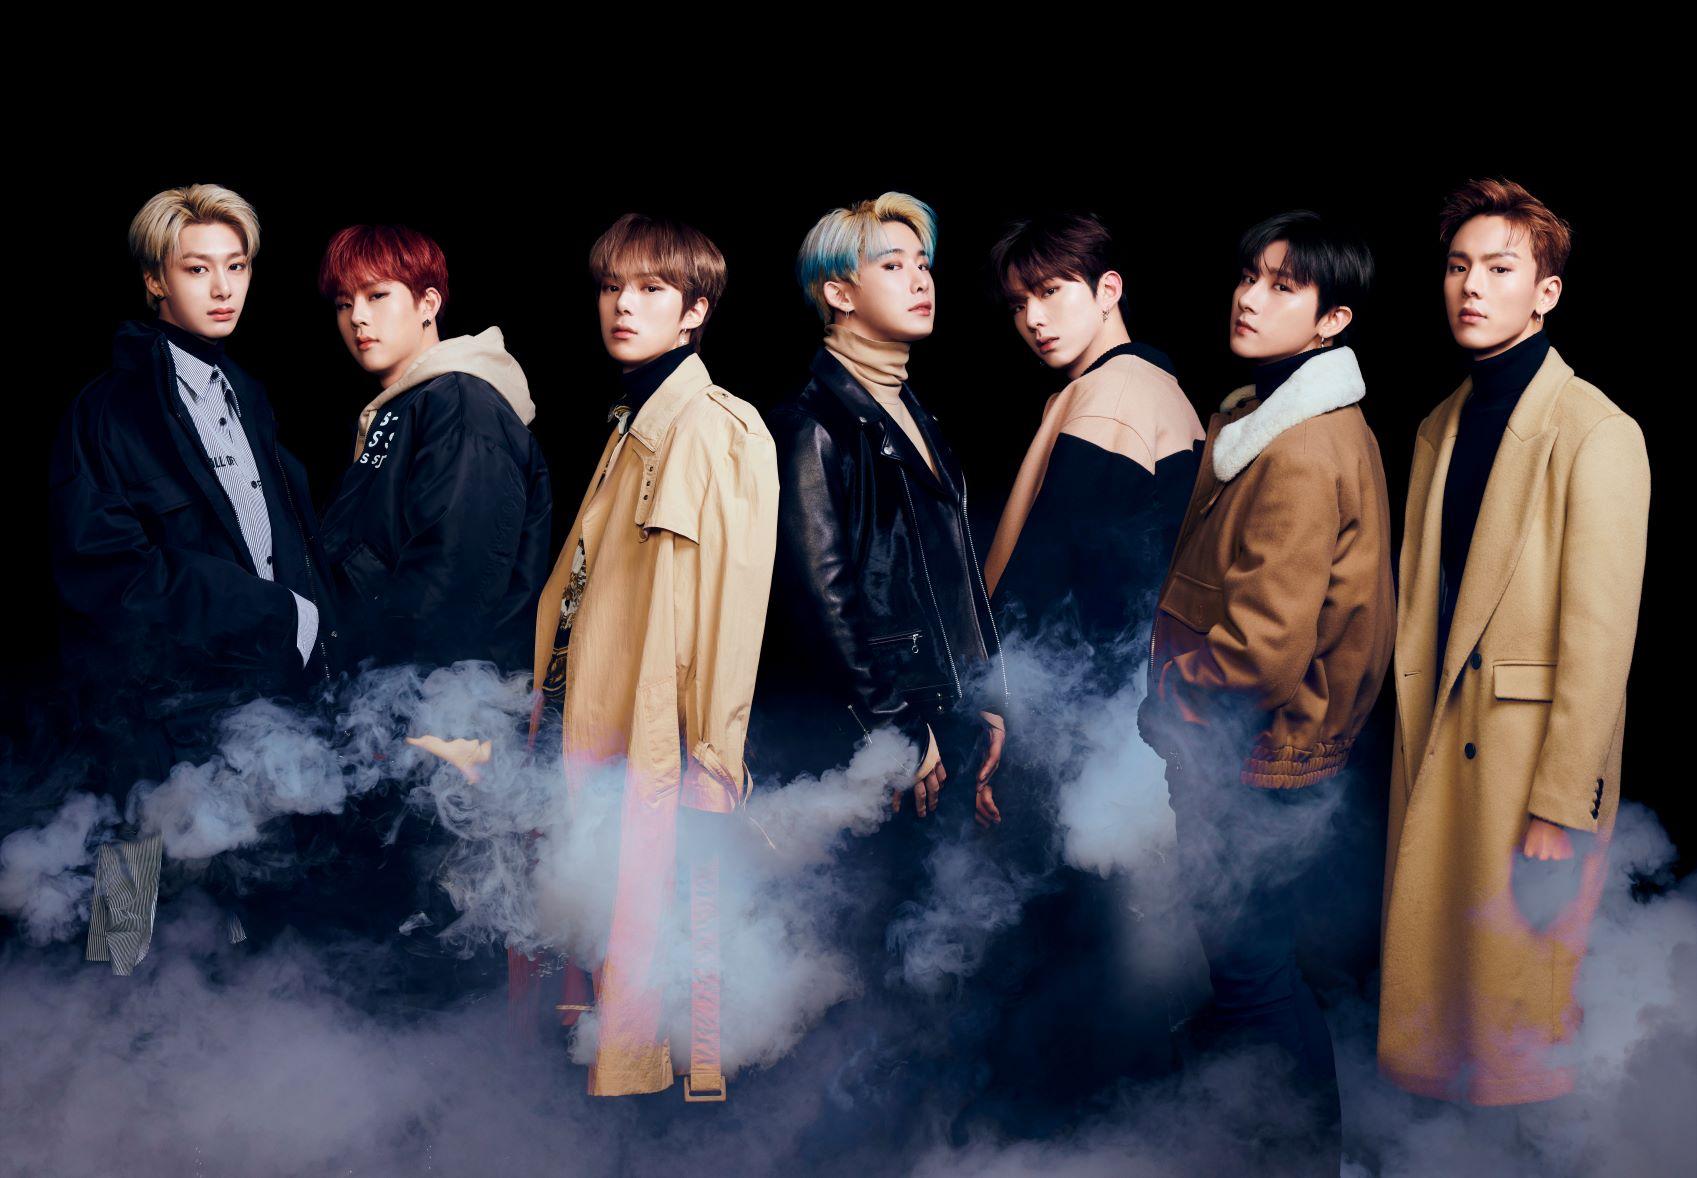 MONSTA X、韓国で4冠を達成した日本語ver. 5thシングル「Shoot Out」発売決定&新ビジュアル解禁